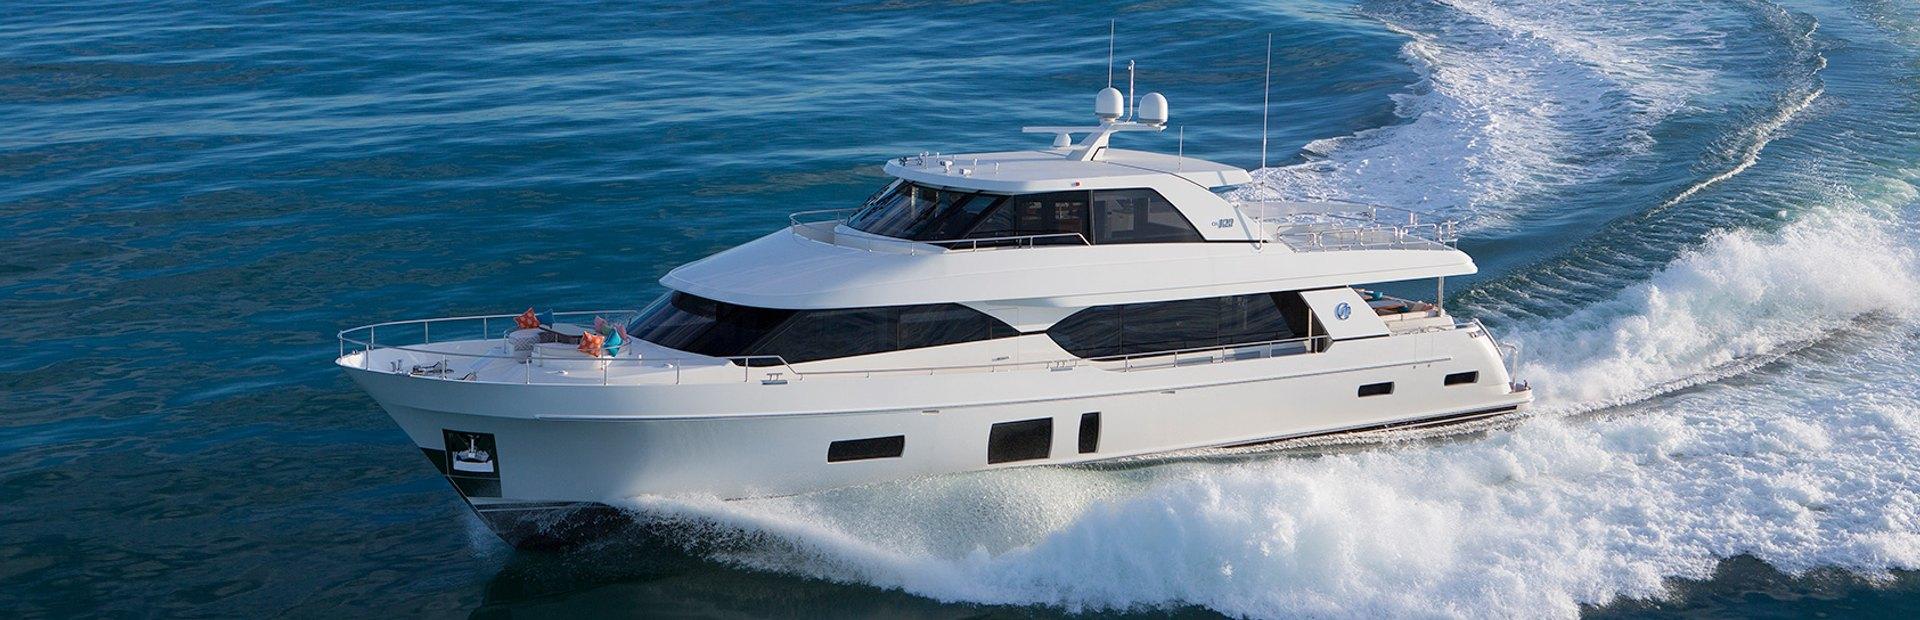 100 Skylounge Yacht Charter